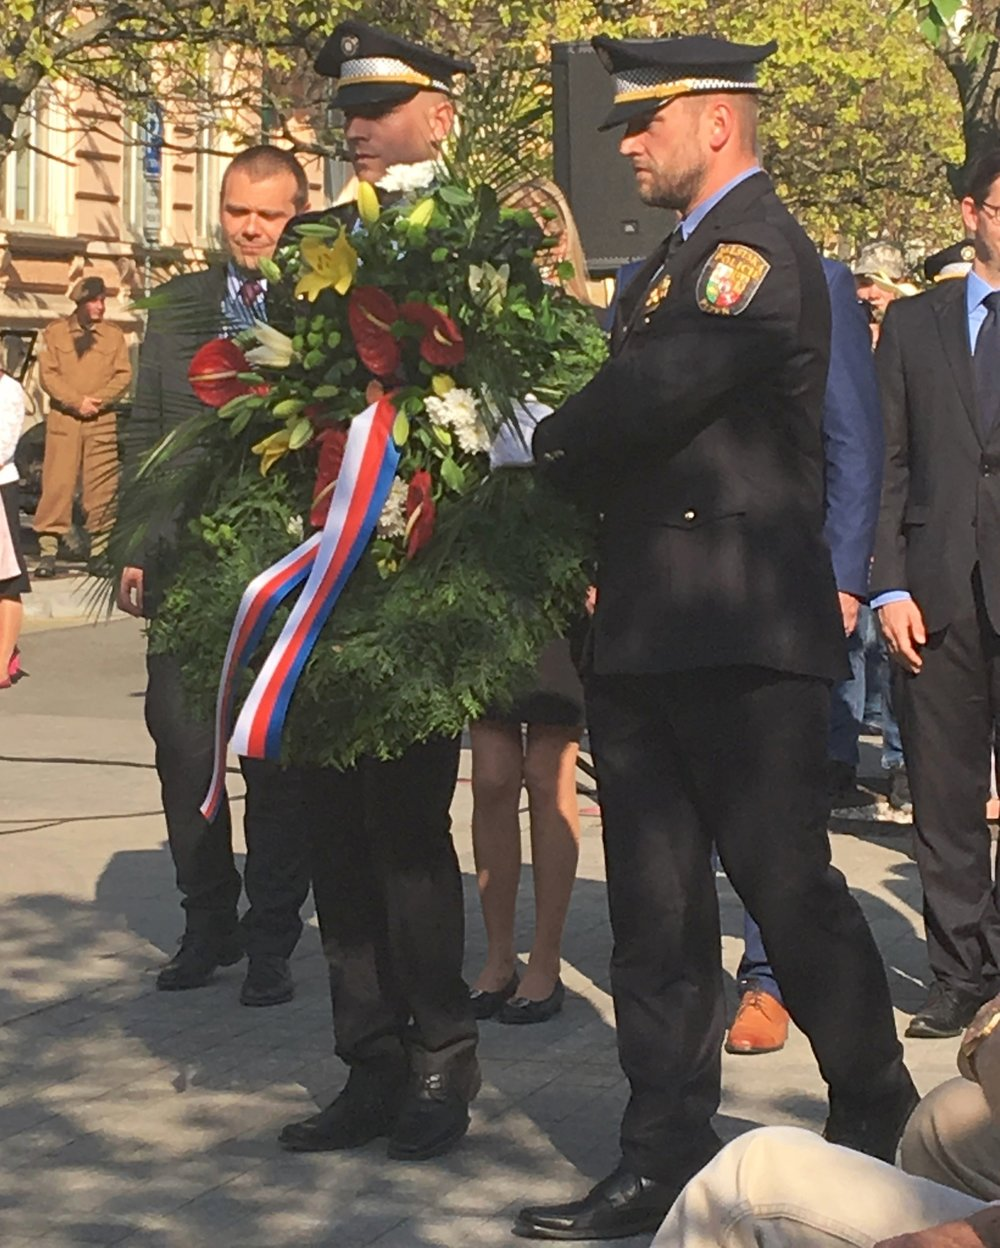 Wreath-Bill's photo.JPG